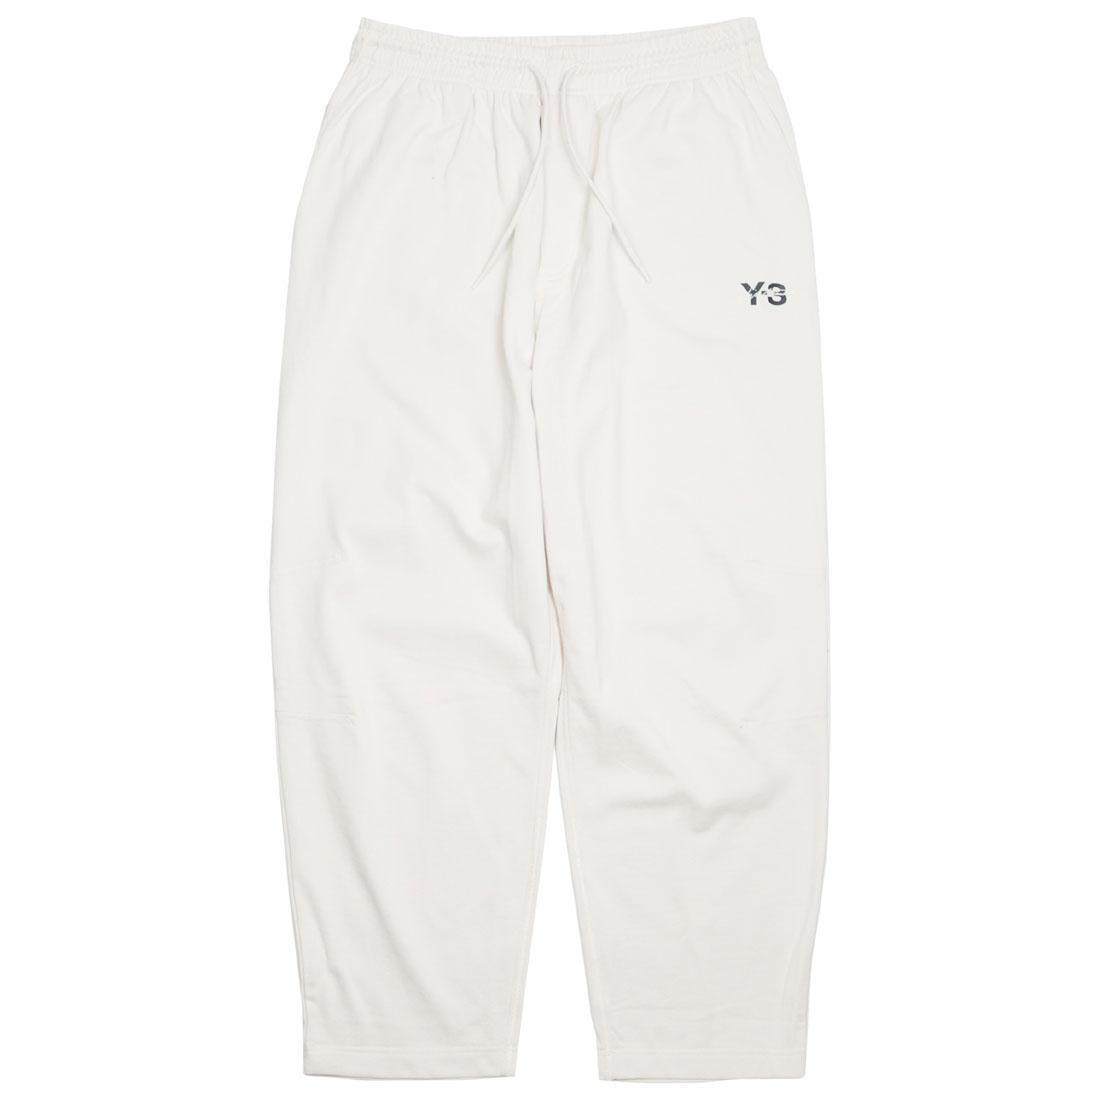 Adidas Y-3 Men Sashiko Pants (beige / champagne / black)